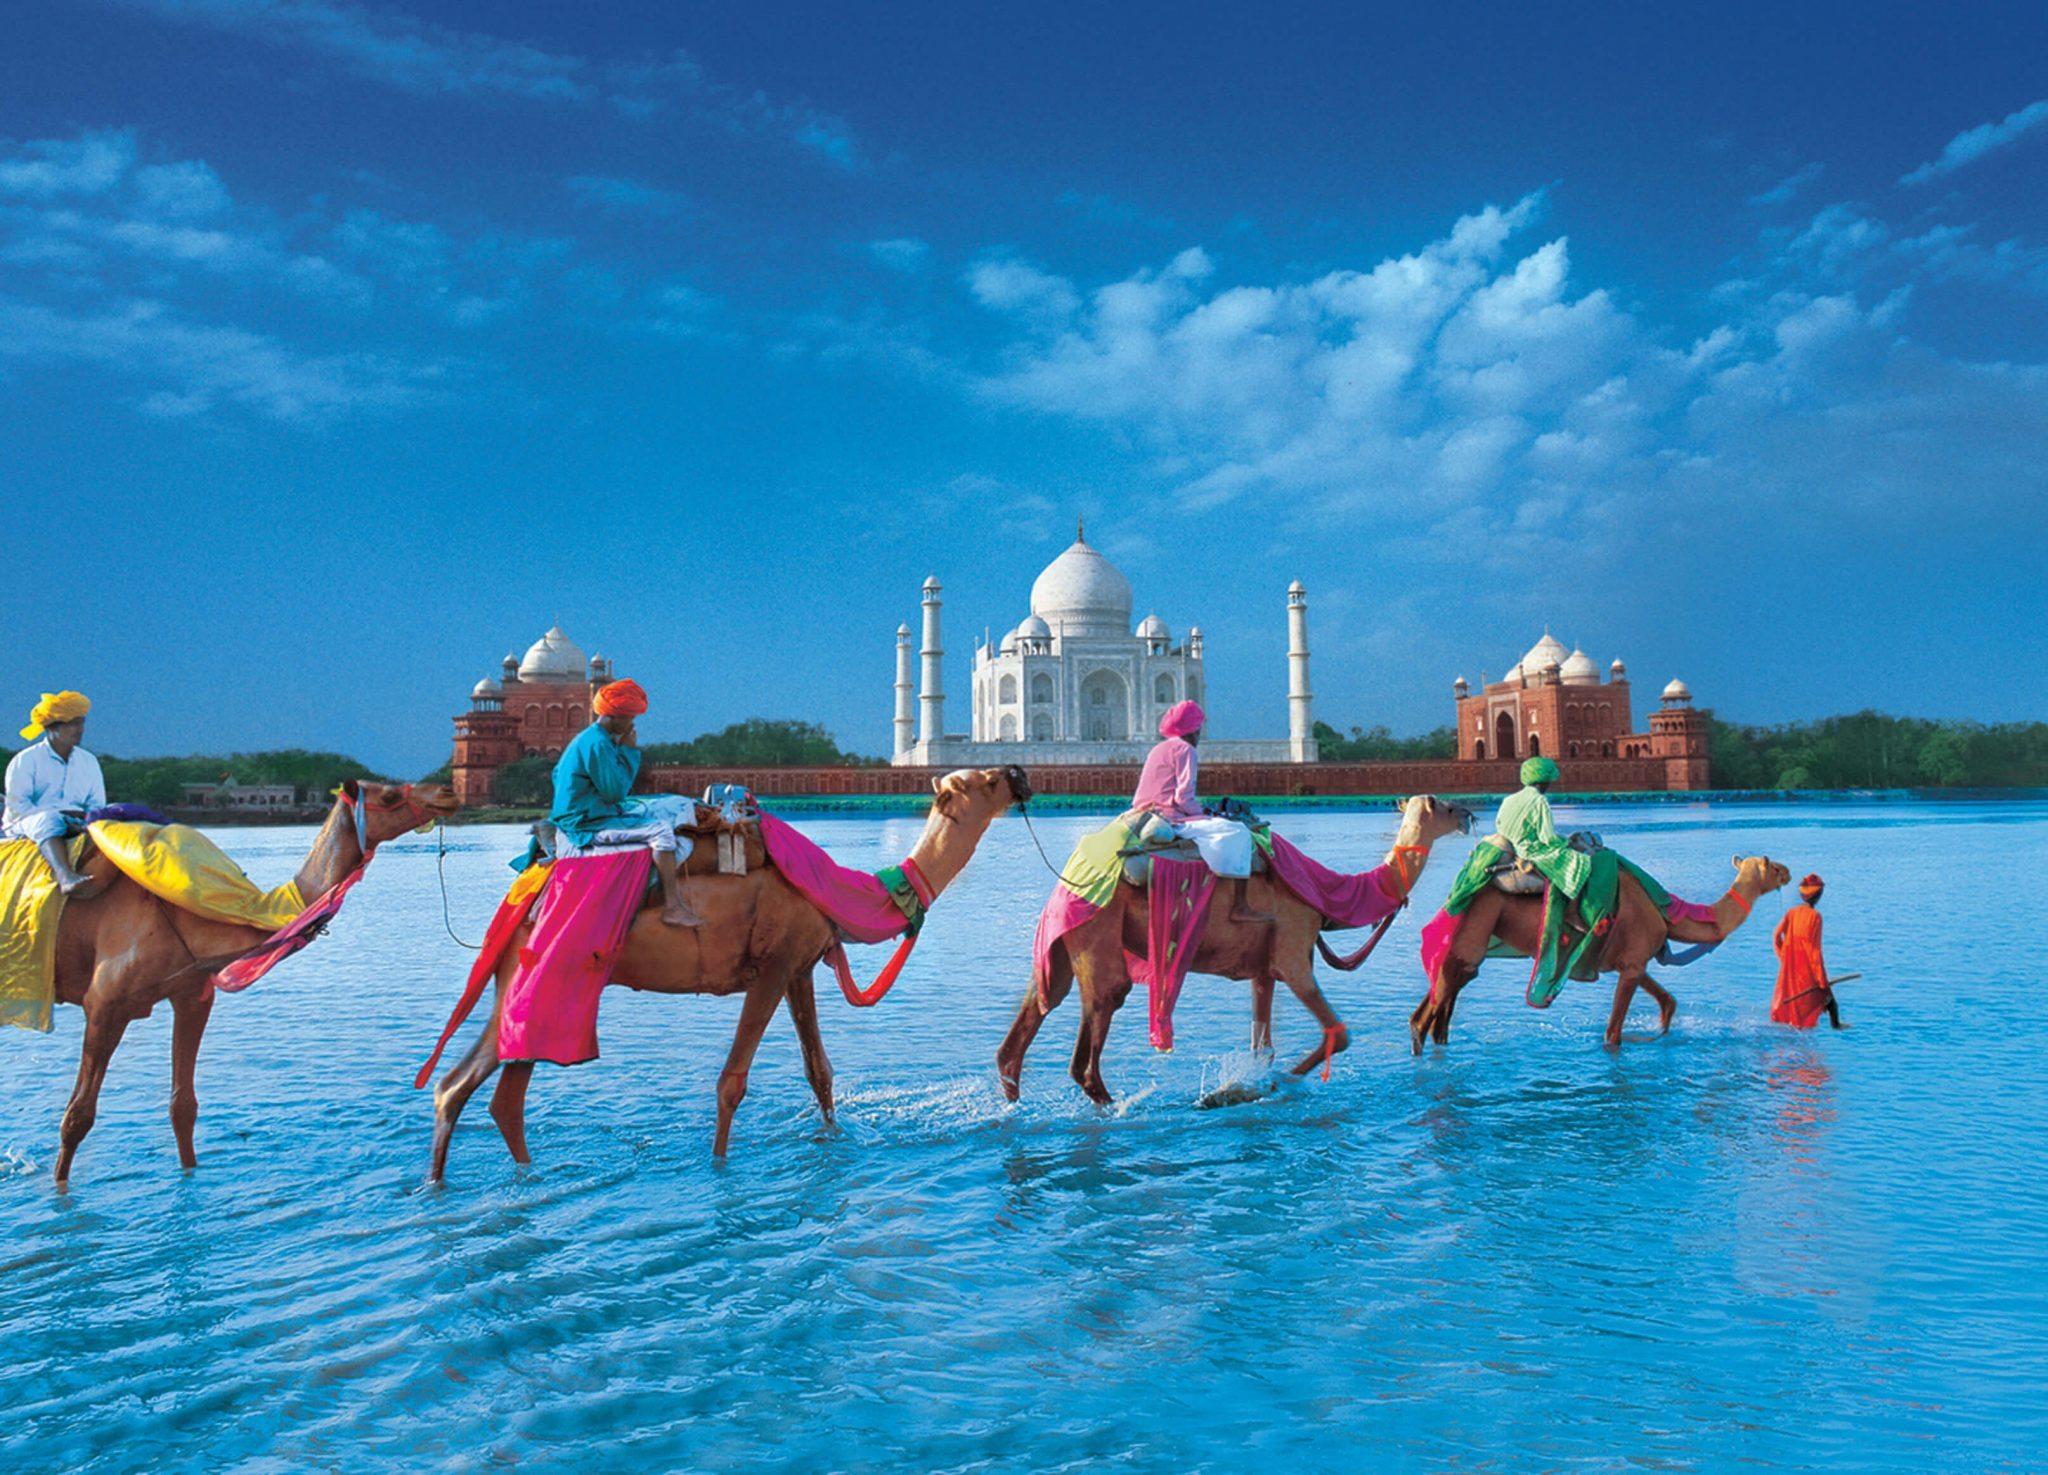 Men on camels cross the Yamuna river ahead of the Taj Mahal